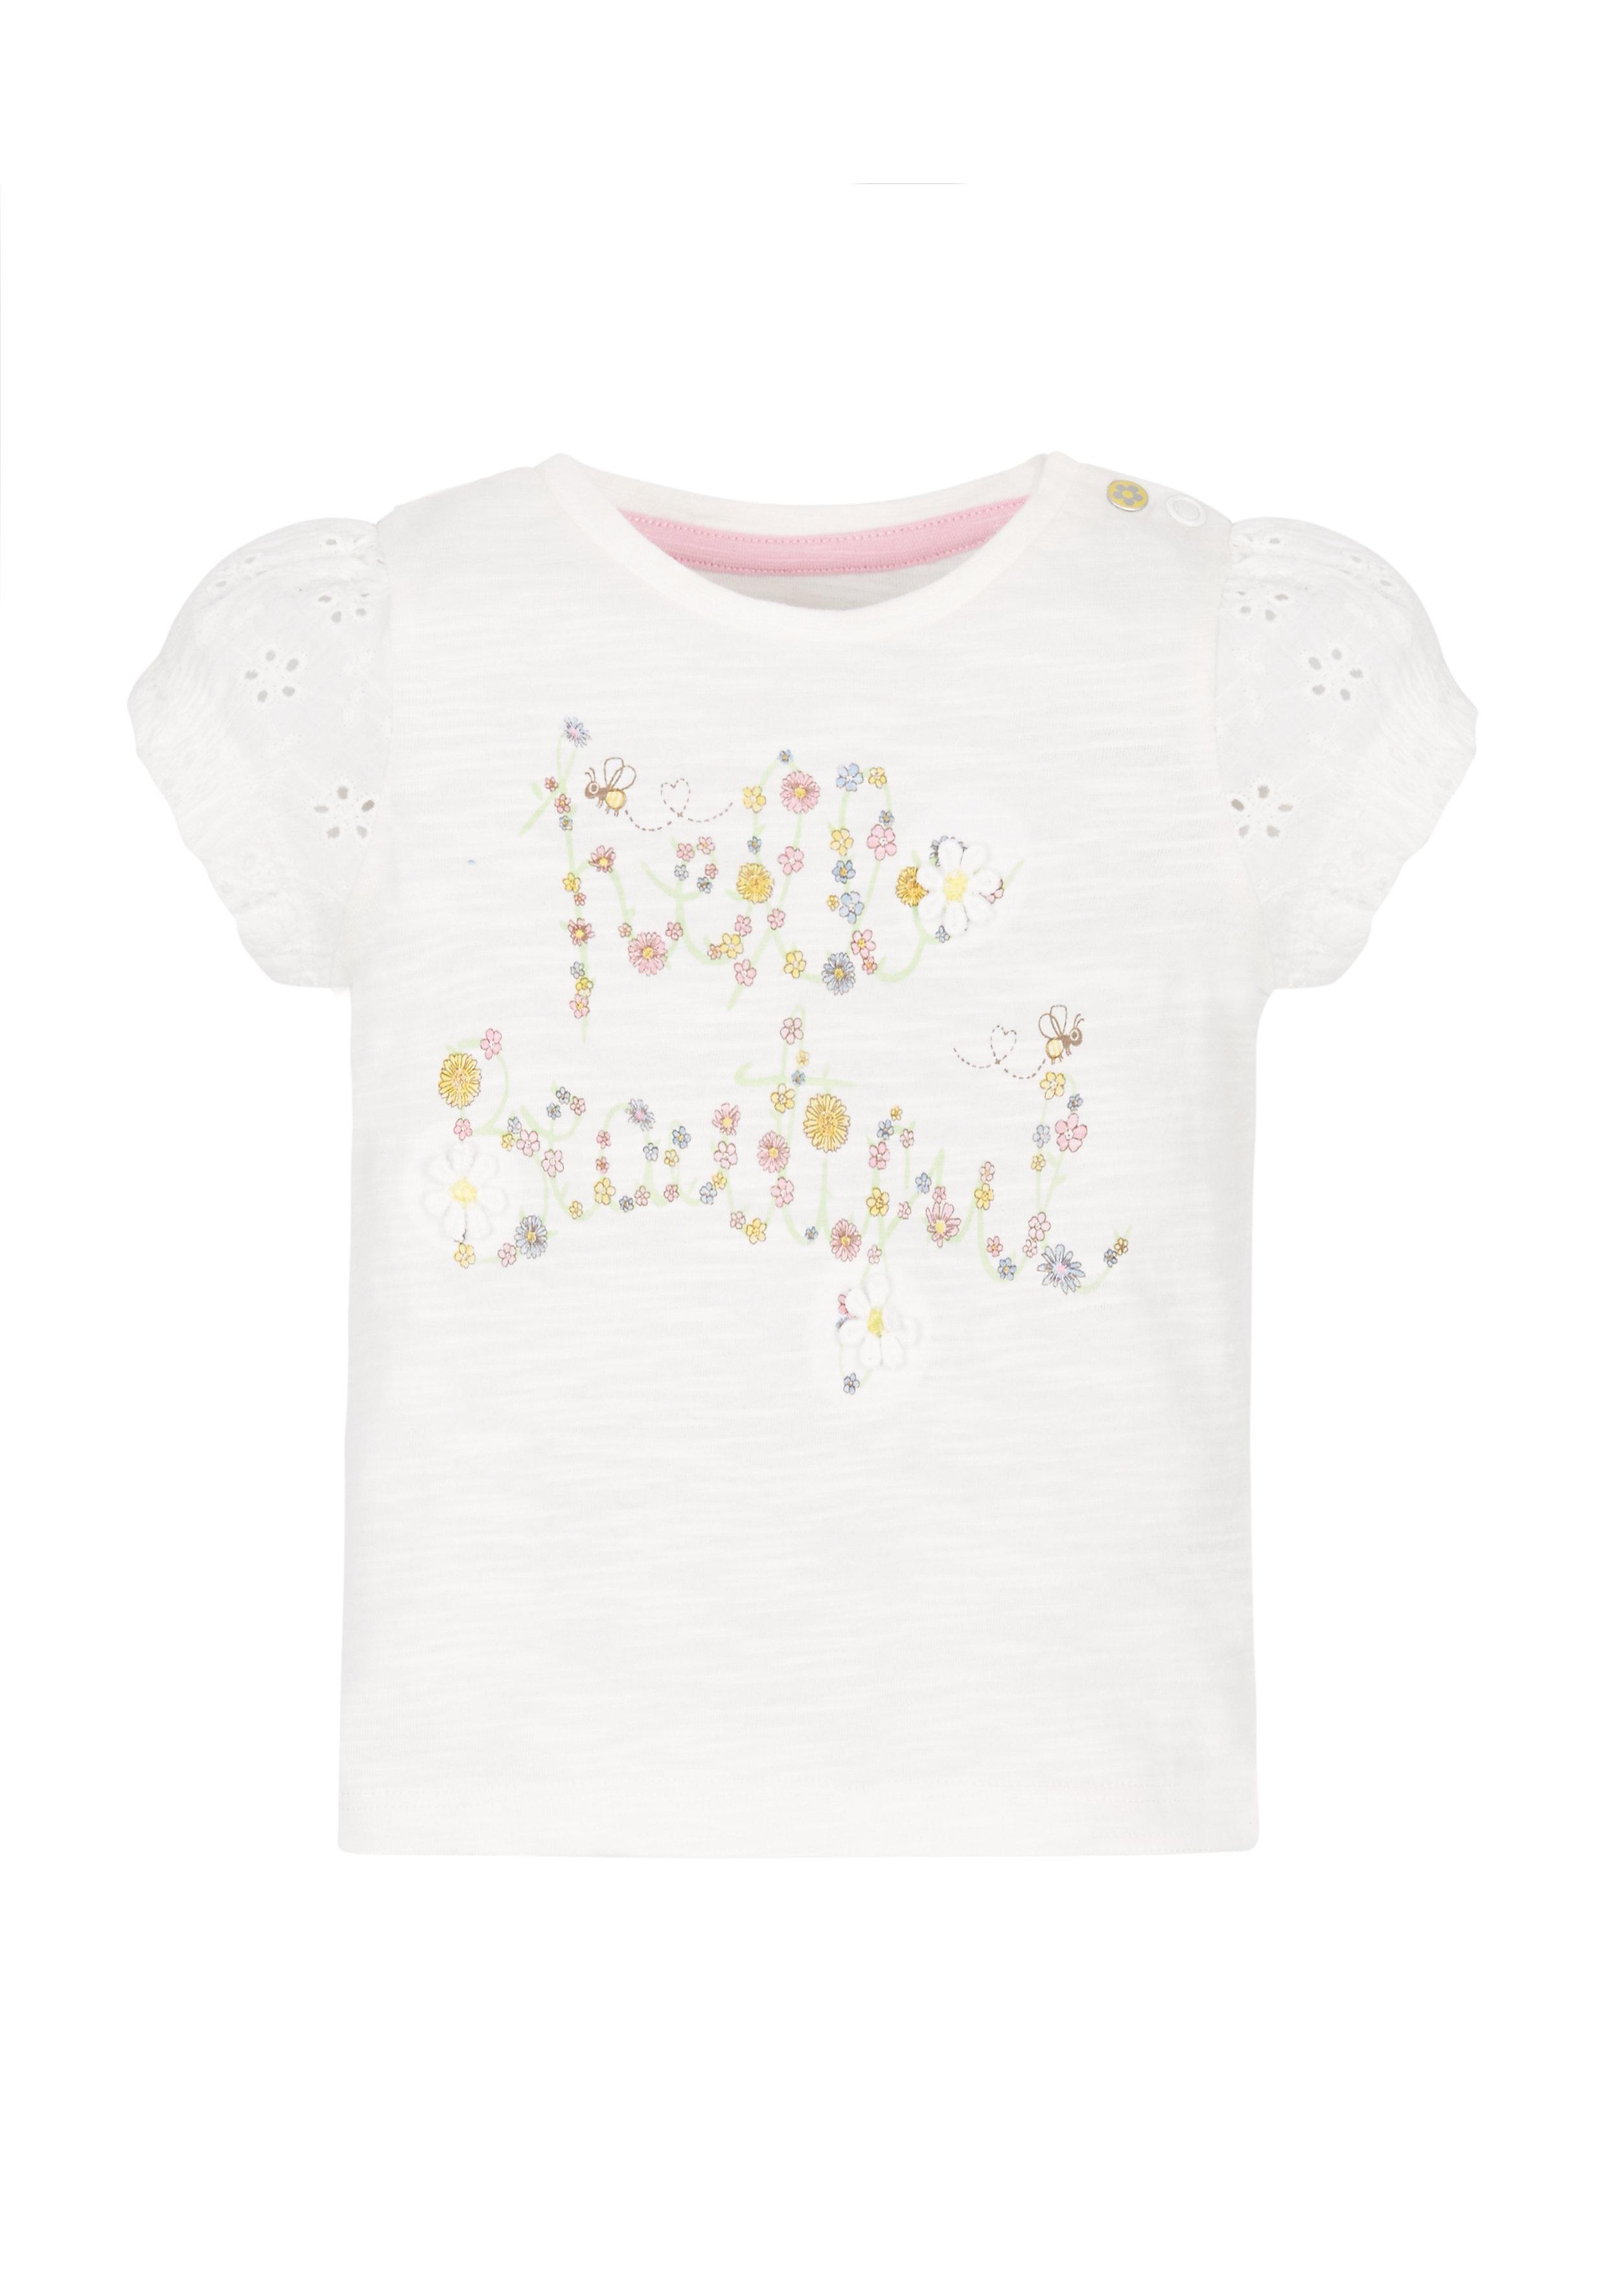 Mothercare | Girls Hello Beautiful T-Shirt - White